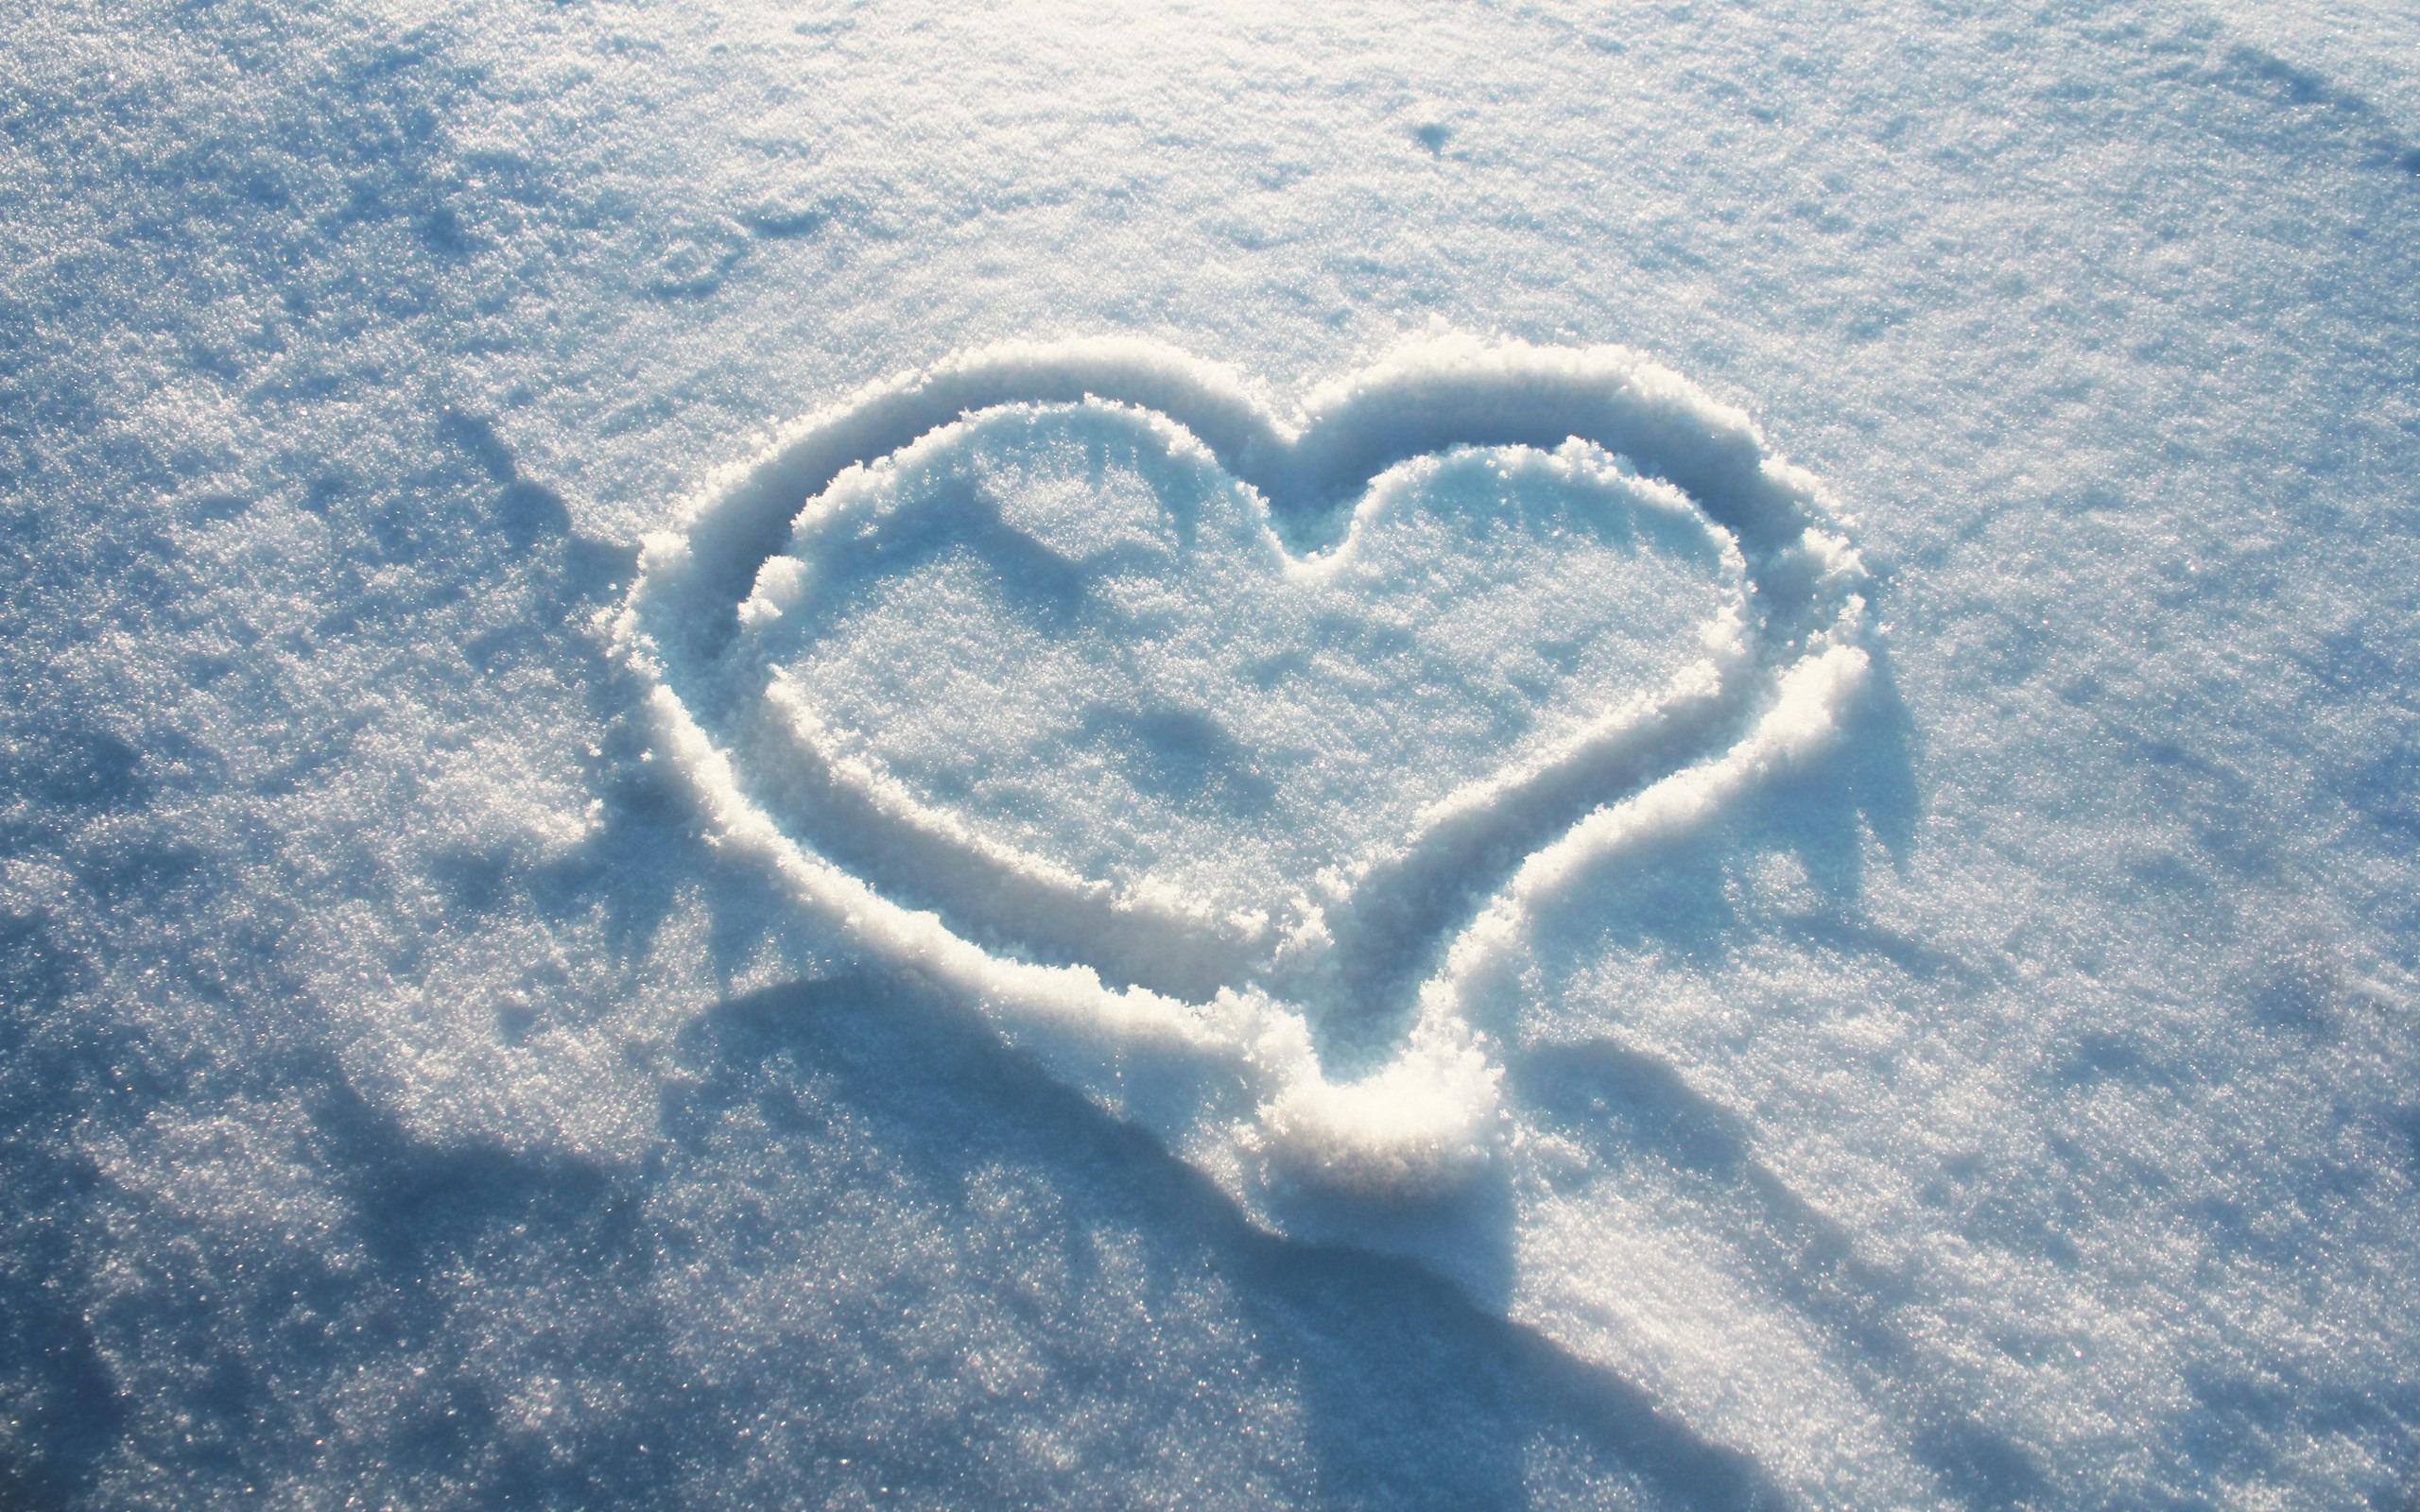 начала картинки сердце на снегу давно уже стал